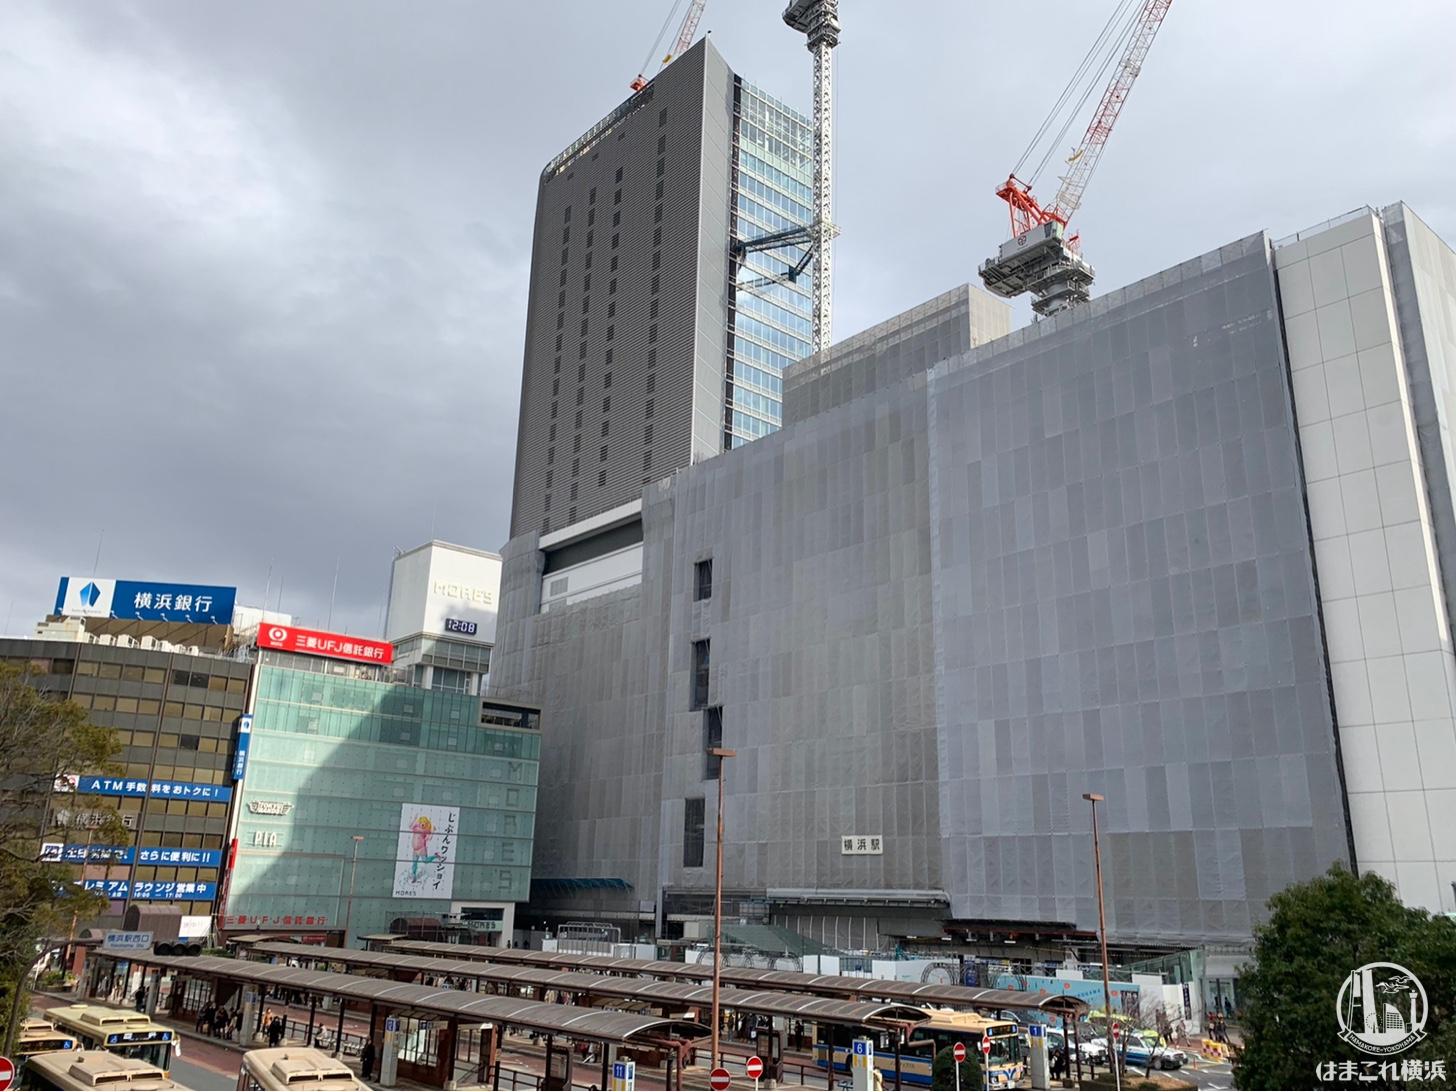 2019年1月 横浜駅西口の様子